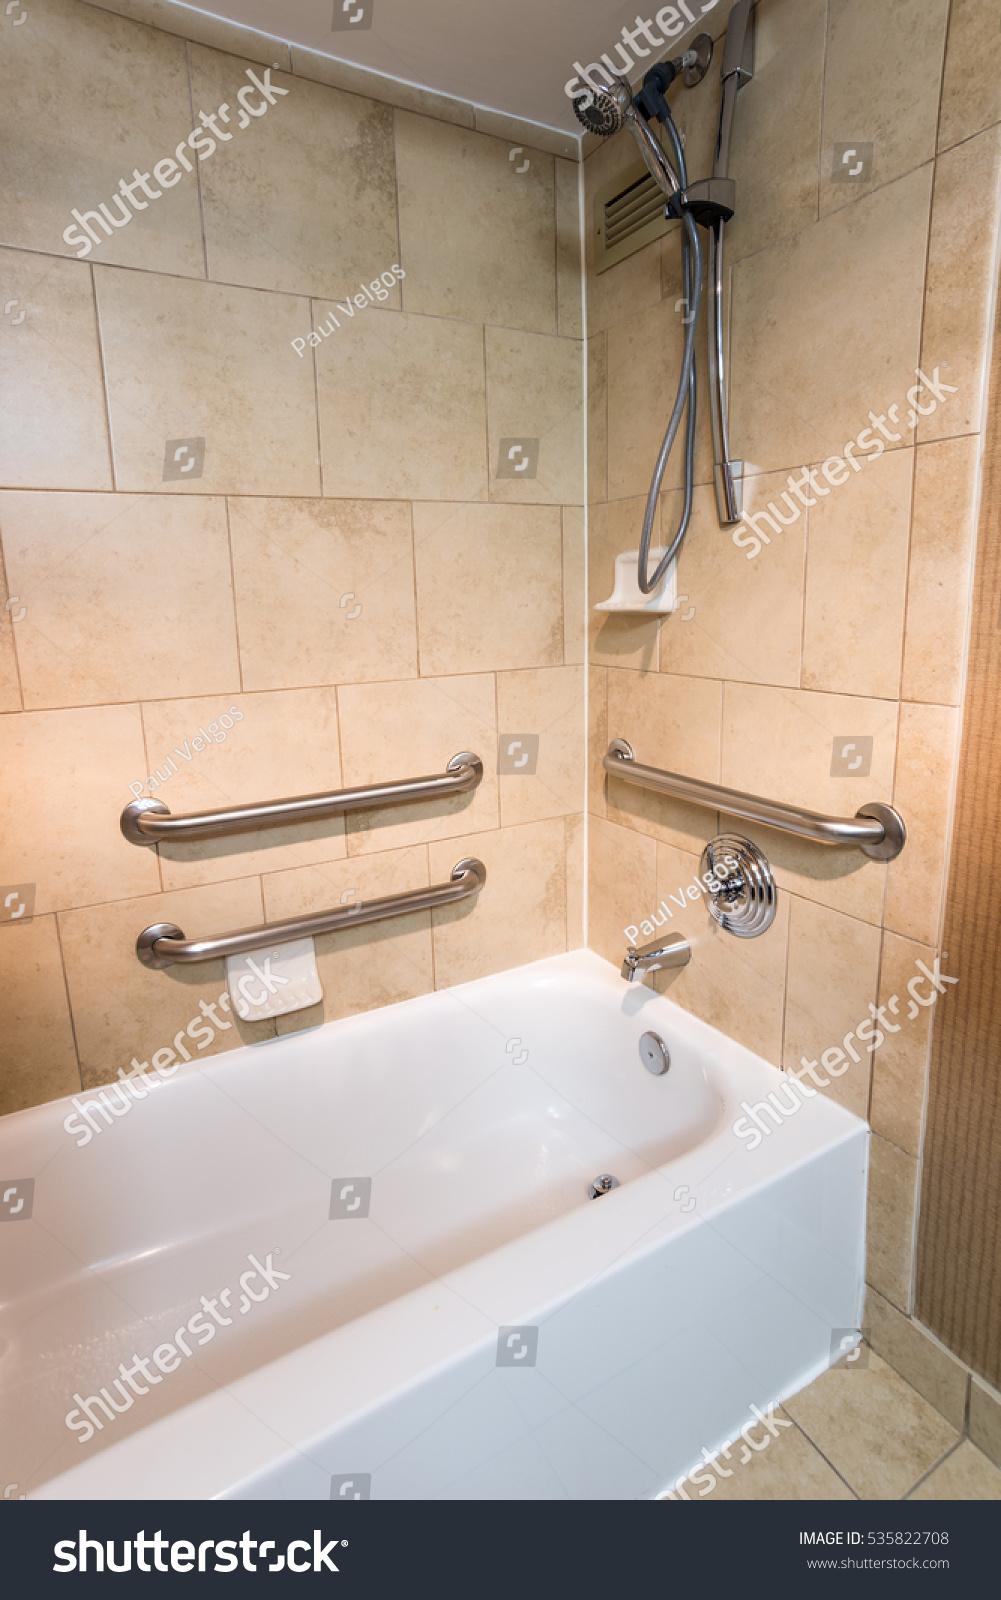 Disability Access Bathtub Shower Hotel Room Stock Photo (Edit Now ...